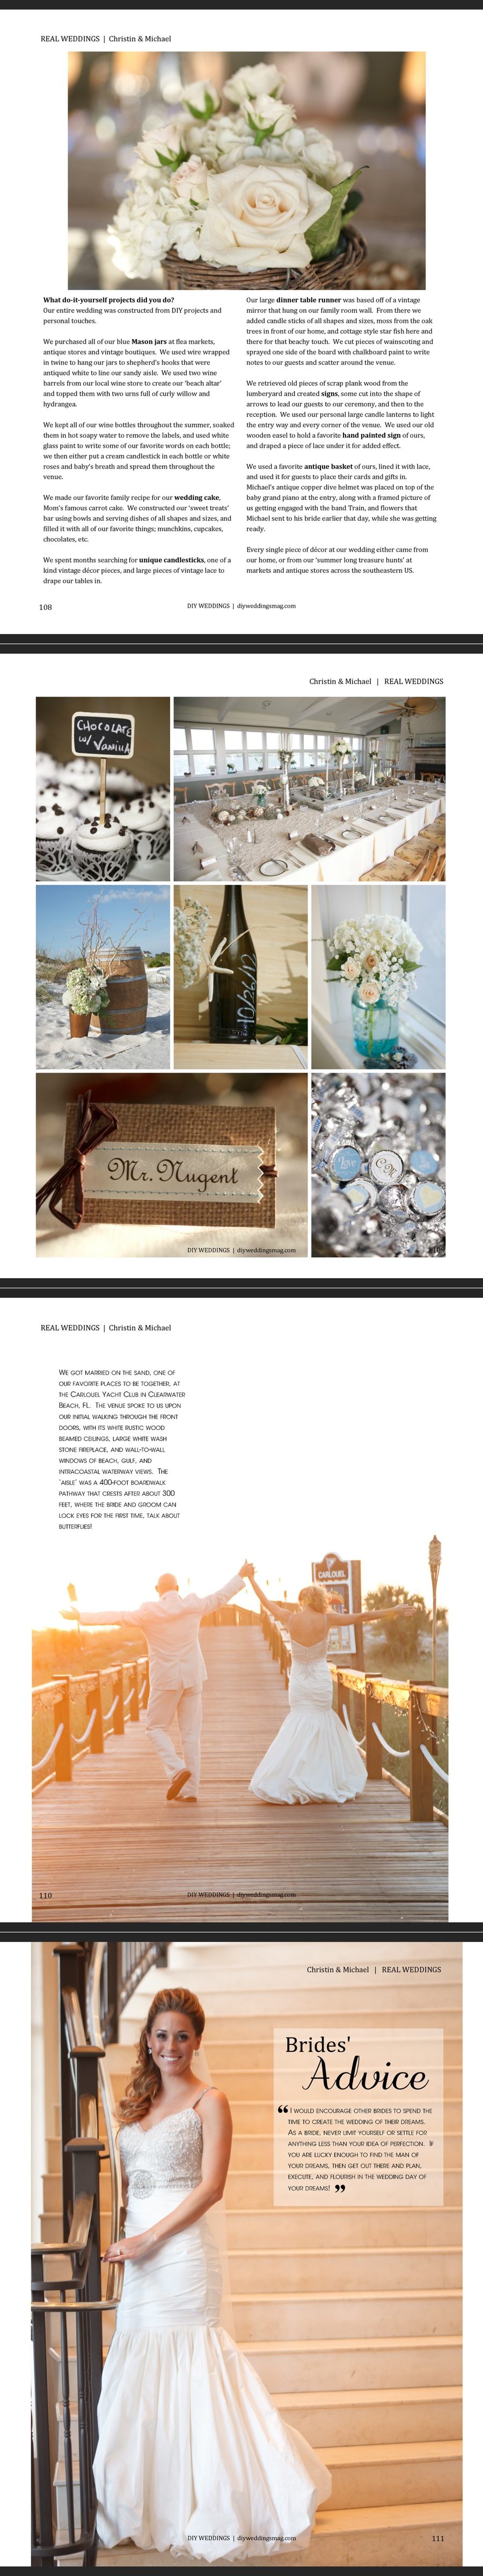 9_3_13 DIY Real Weddings Magazine Feature Carlouel Yacht Club_0003.jpg